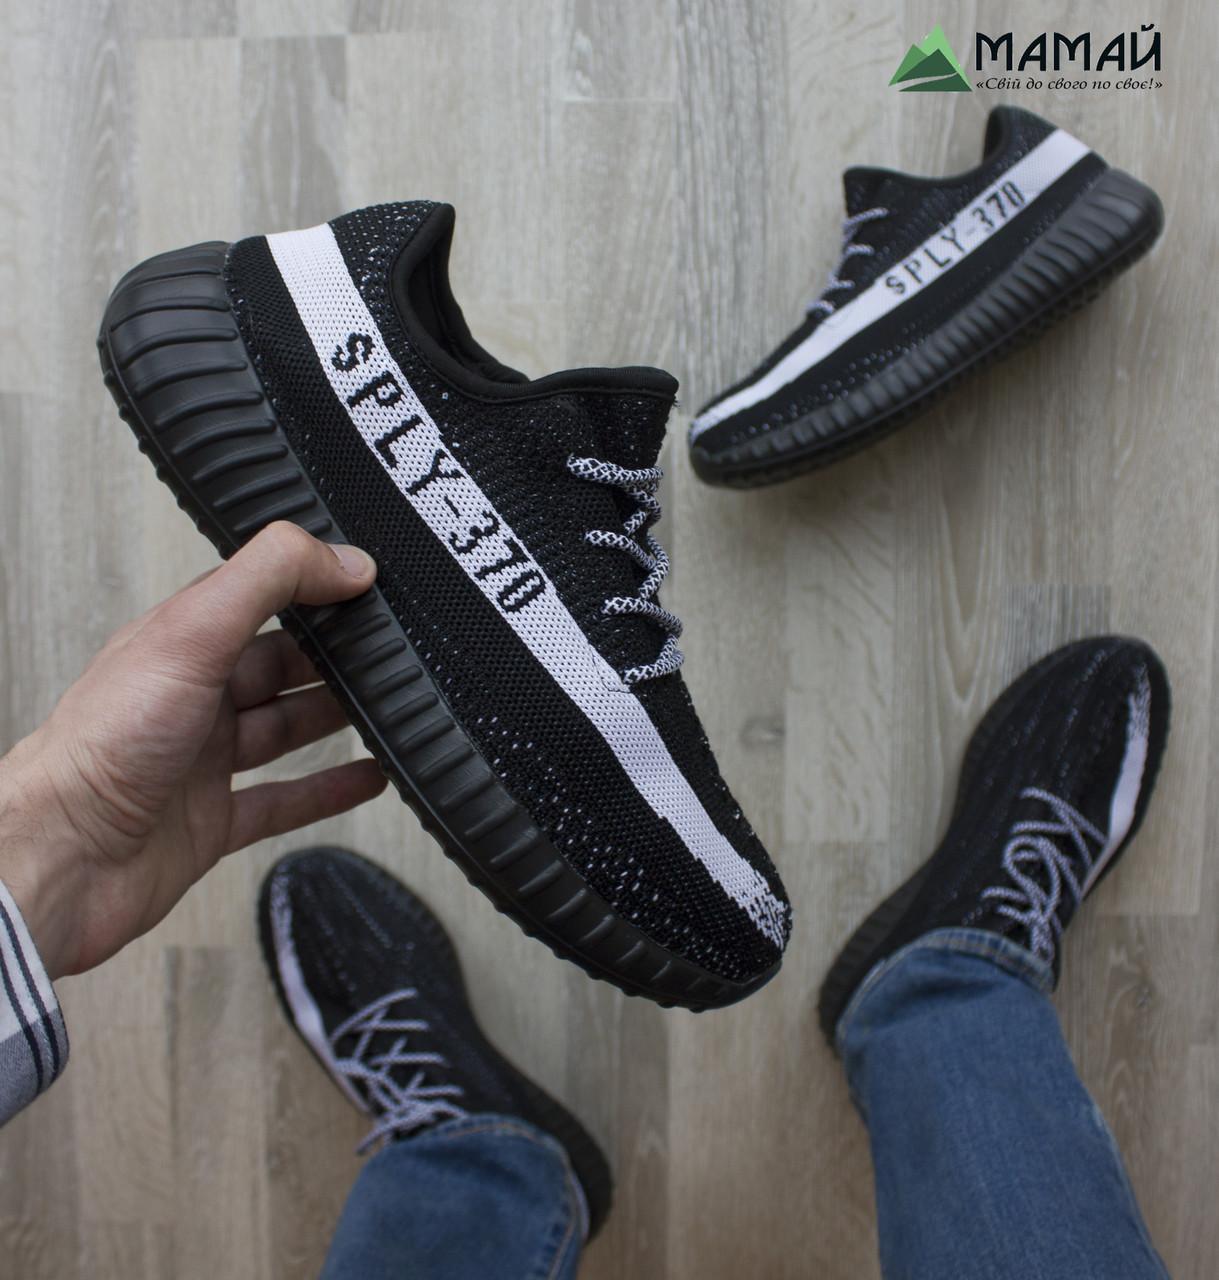 separation shoes 0edfd 88497 Мужские кроссовки Adidas Yeezy Boost SPLY-370 реплика